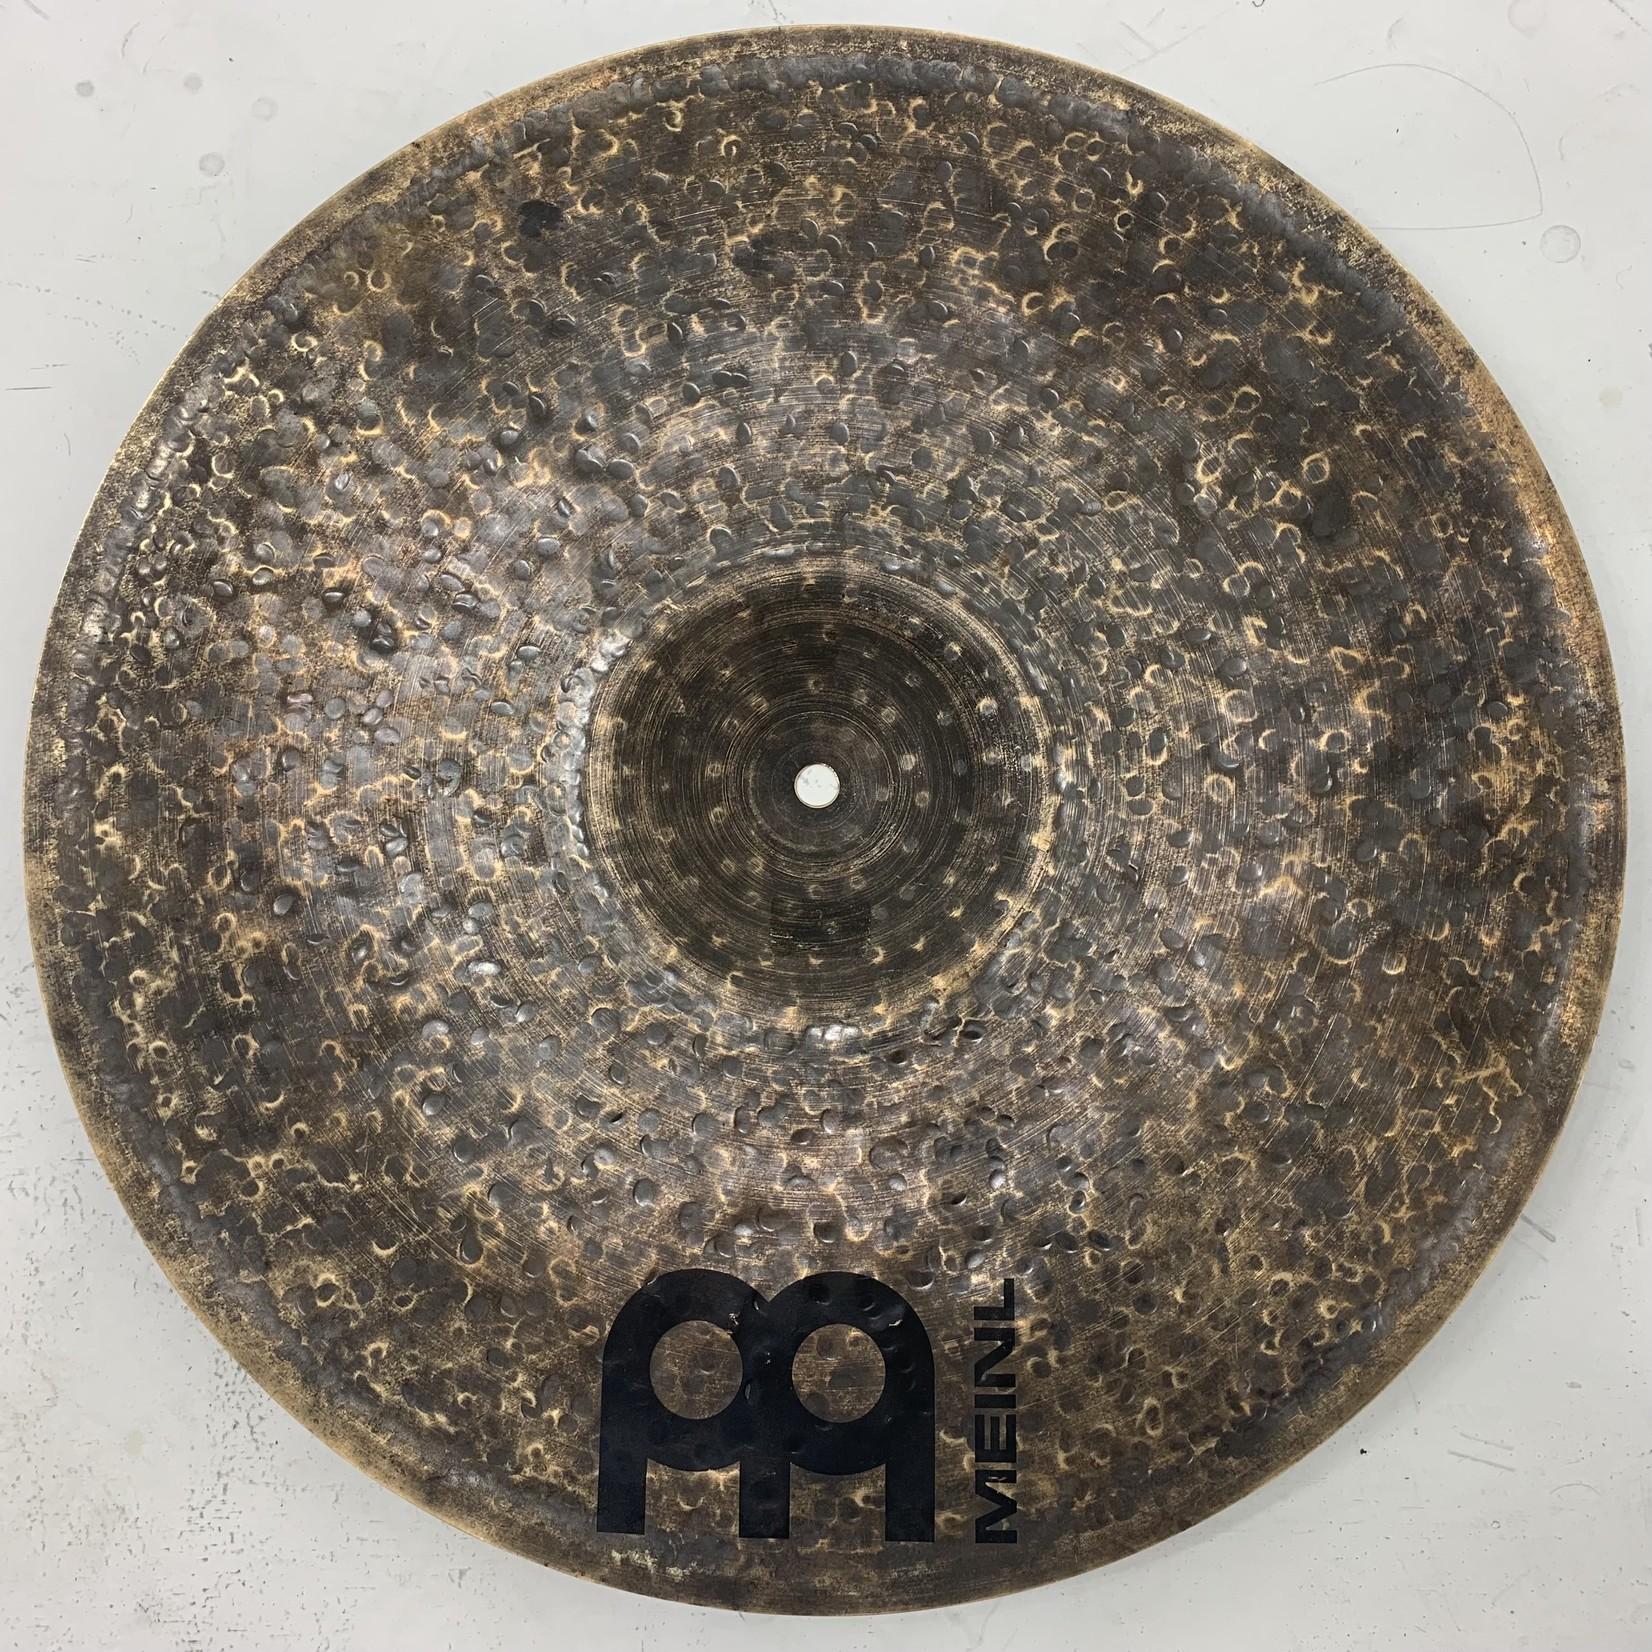 "USED Meinl Byzance 18"" Dark Crash Cymbal (Michael Wagener Collection)"